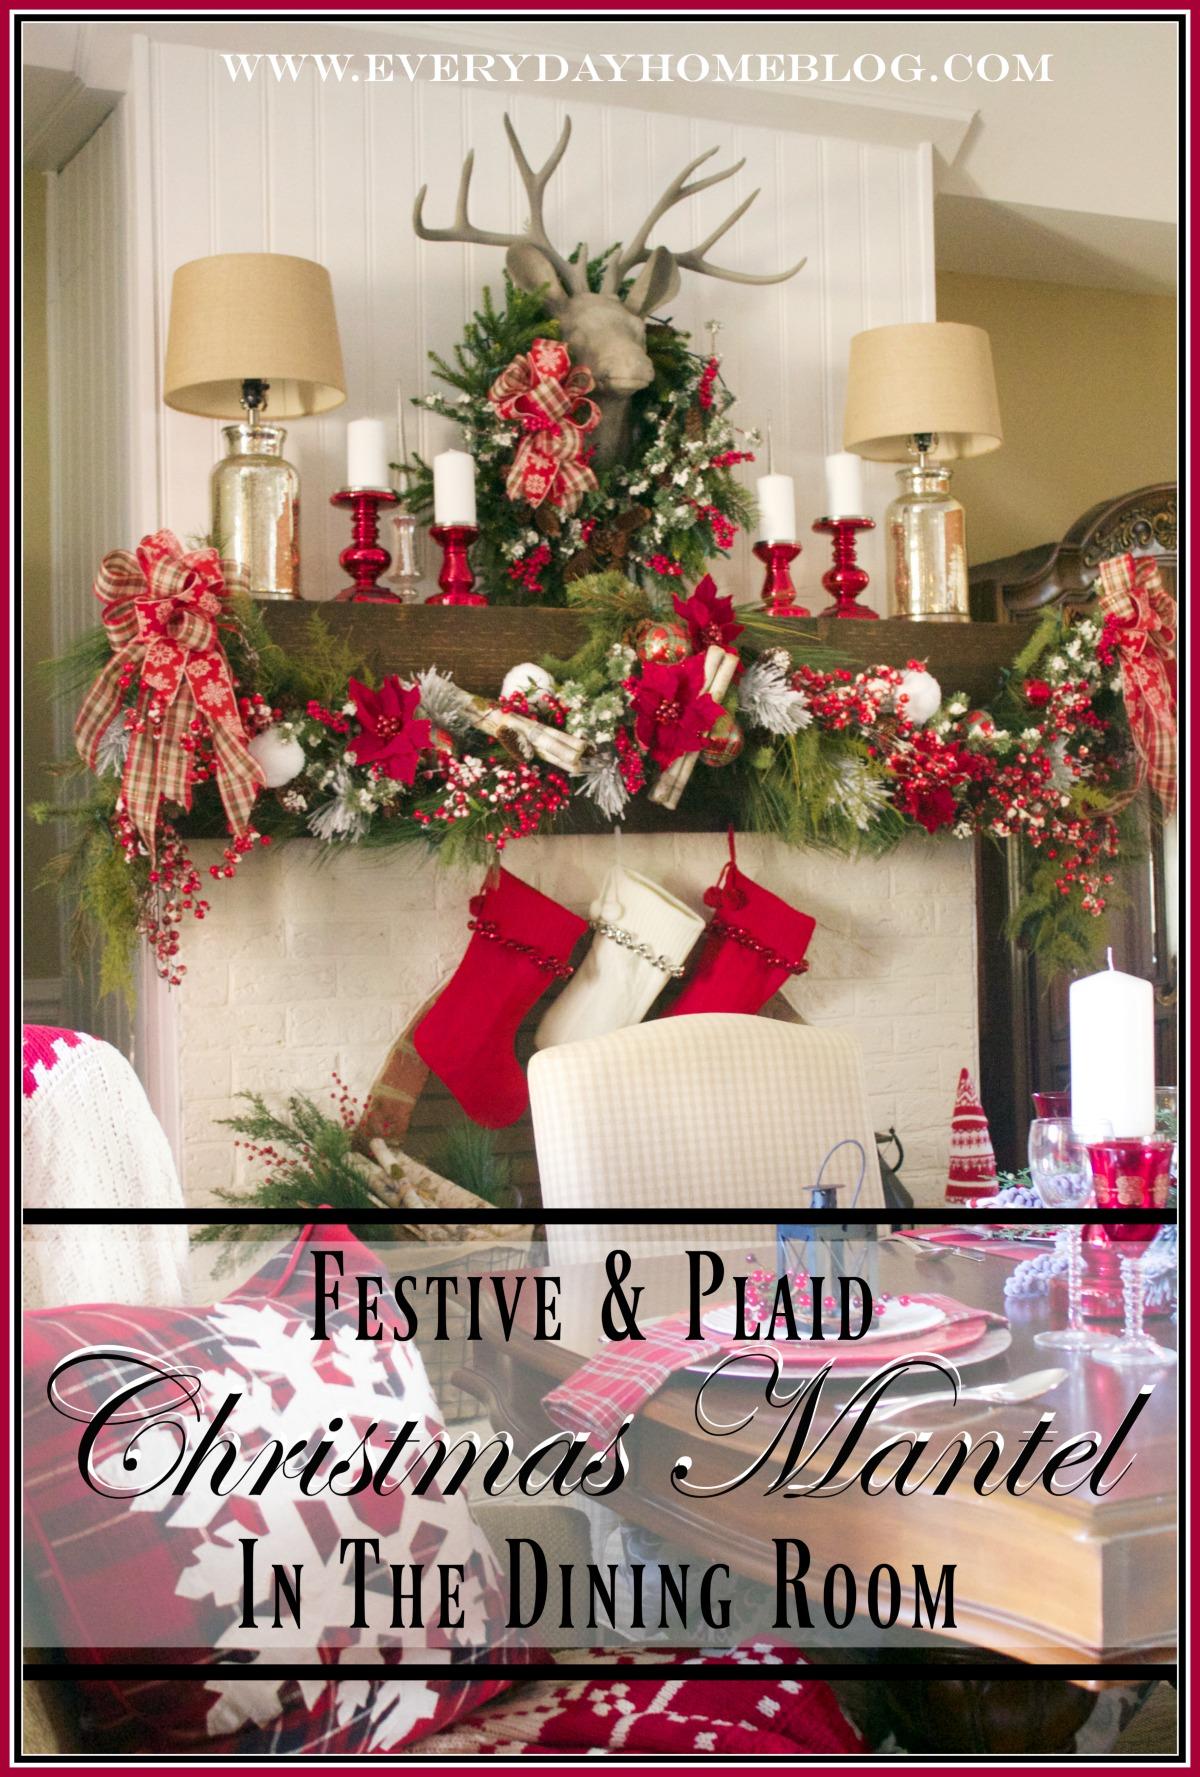 a-festive-plaid-christmas-mantel-in-the-dining-room | The Everyday Home | www.everydayhomeblog.com